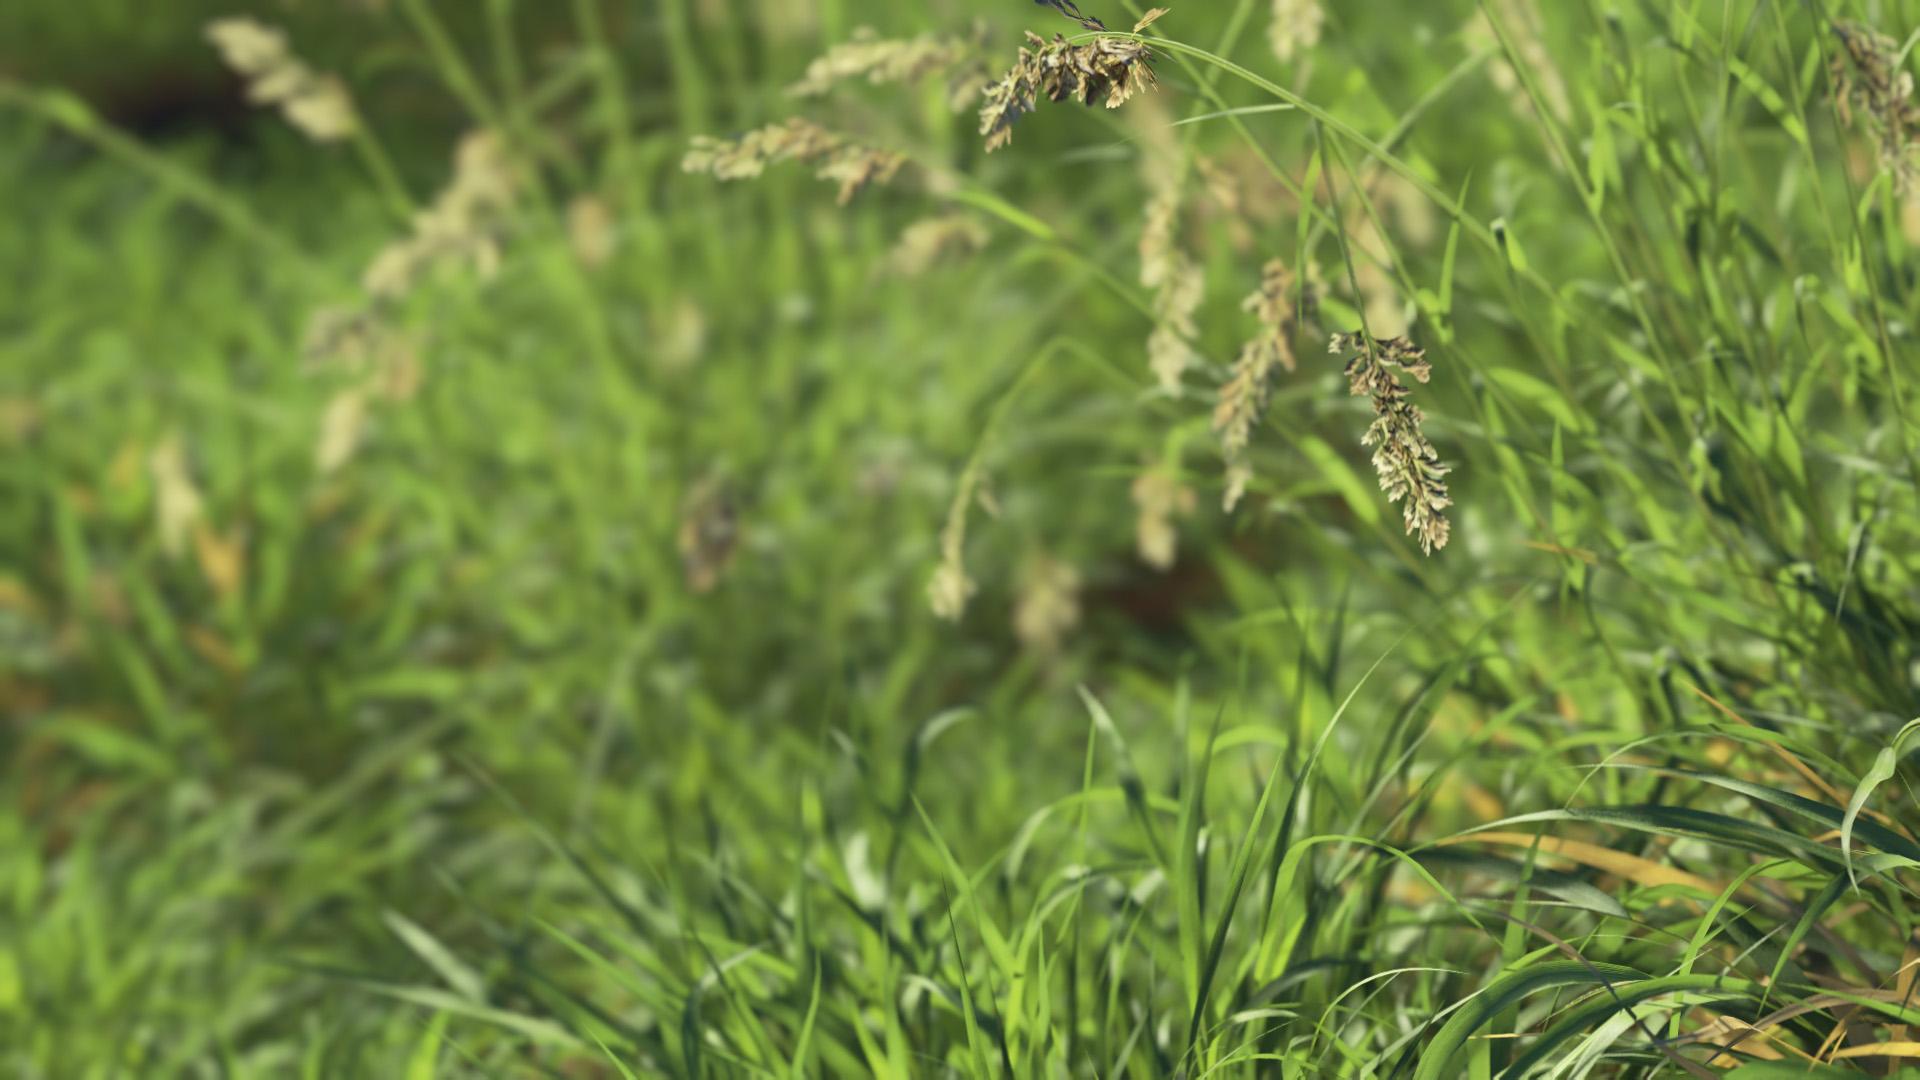 3D model of the Reed canary grass Phalaris arundinacea close-up